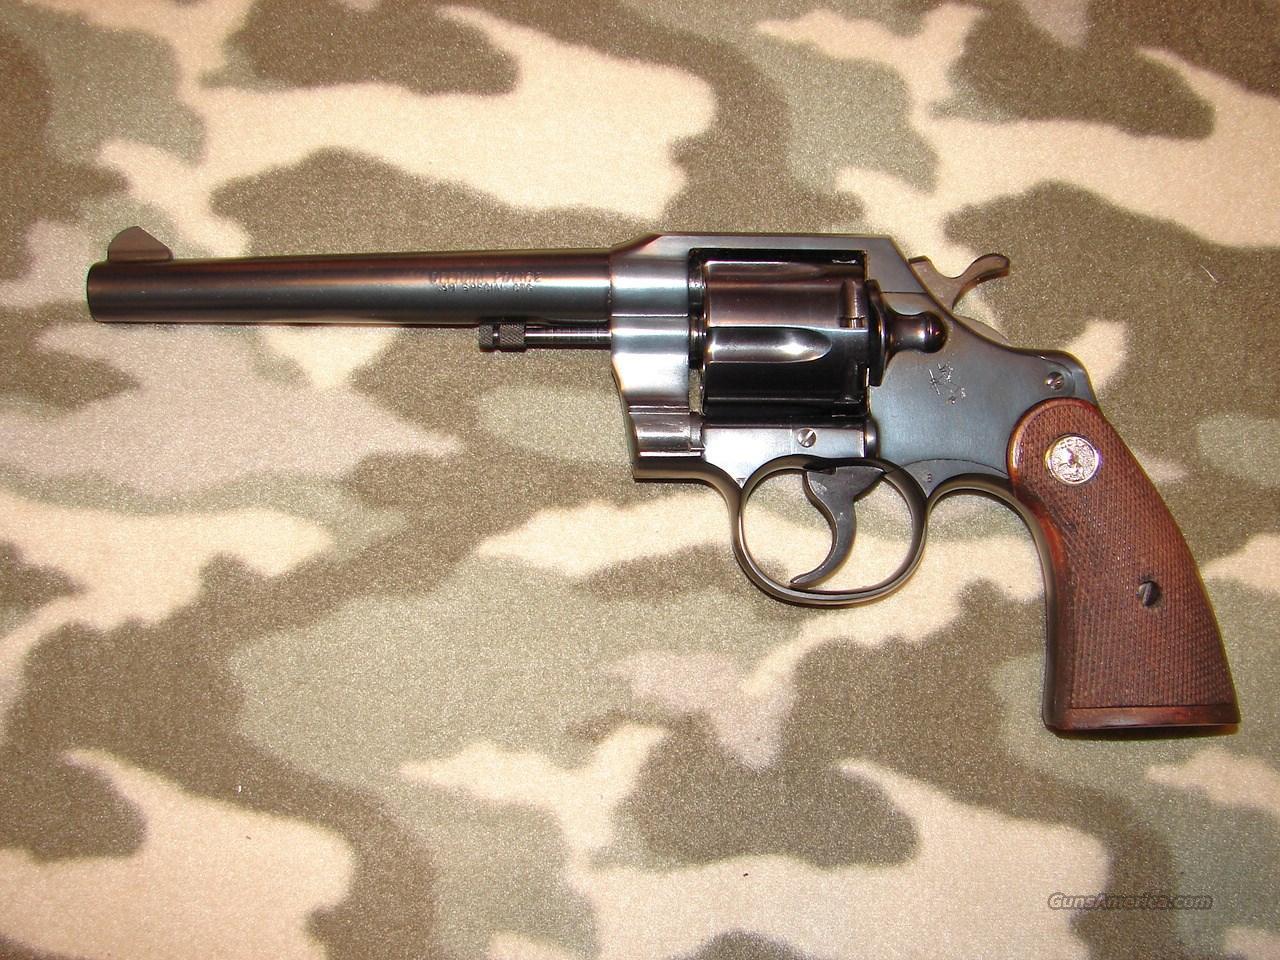 Colt Official Police  Guns > Pistols > Colt Double Action Revolvers- Modern